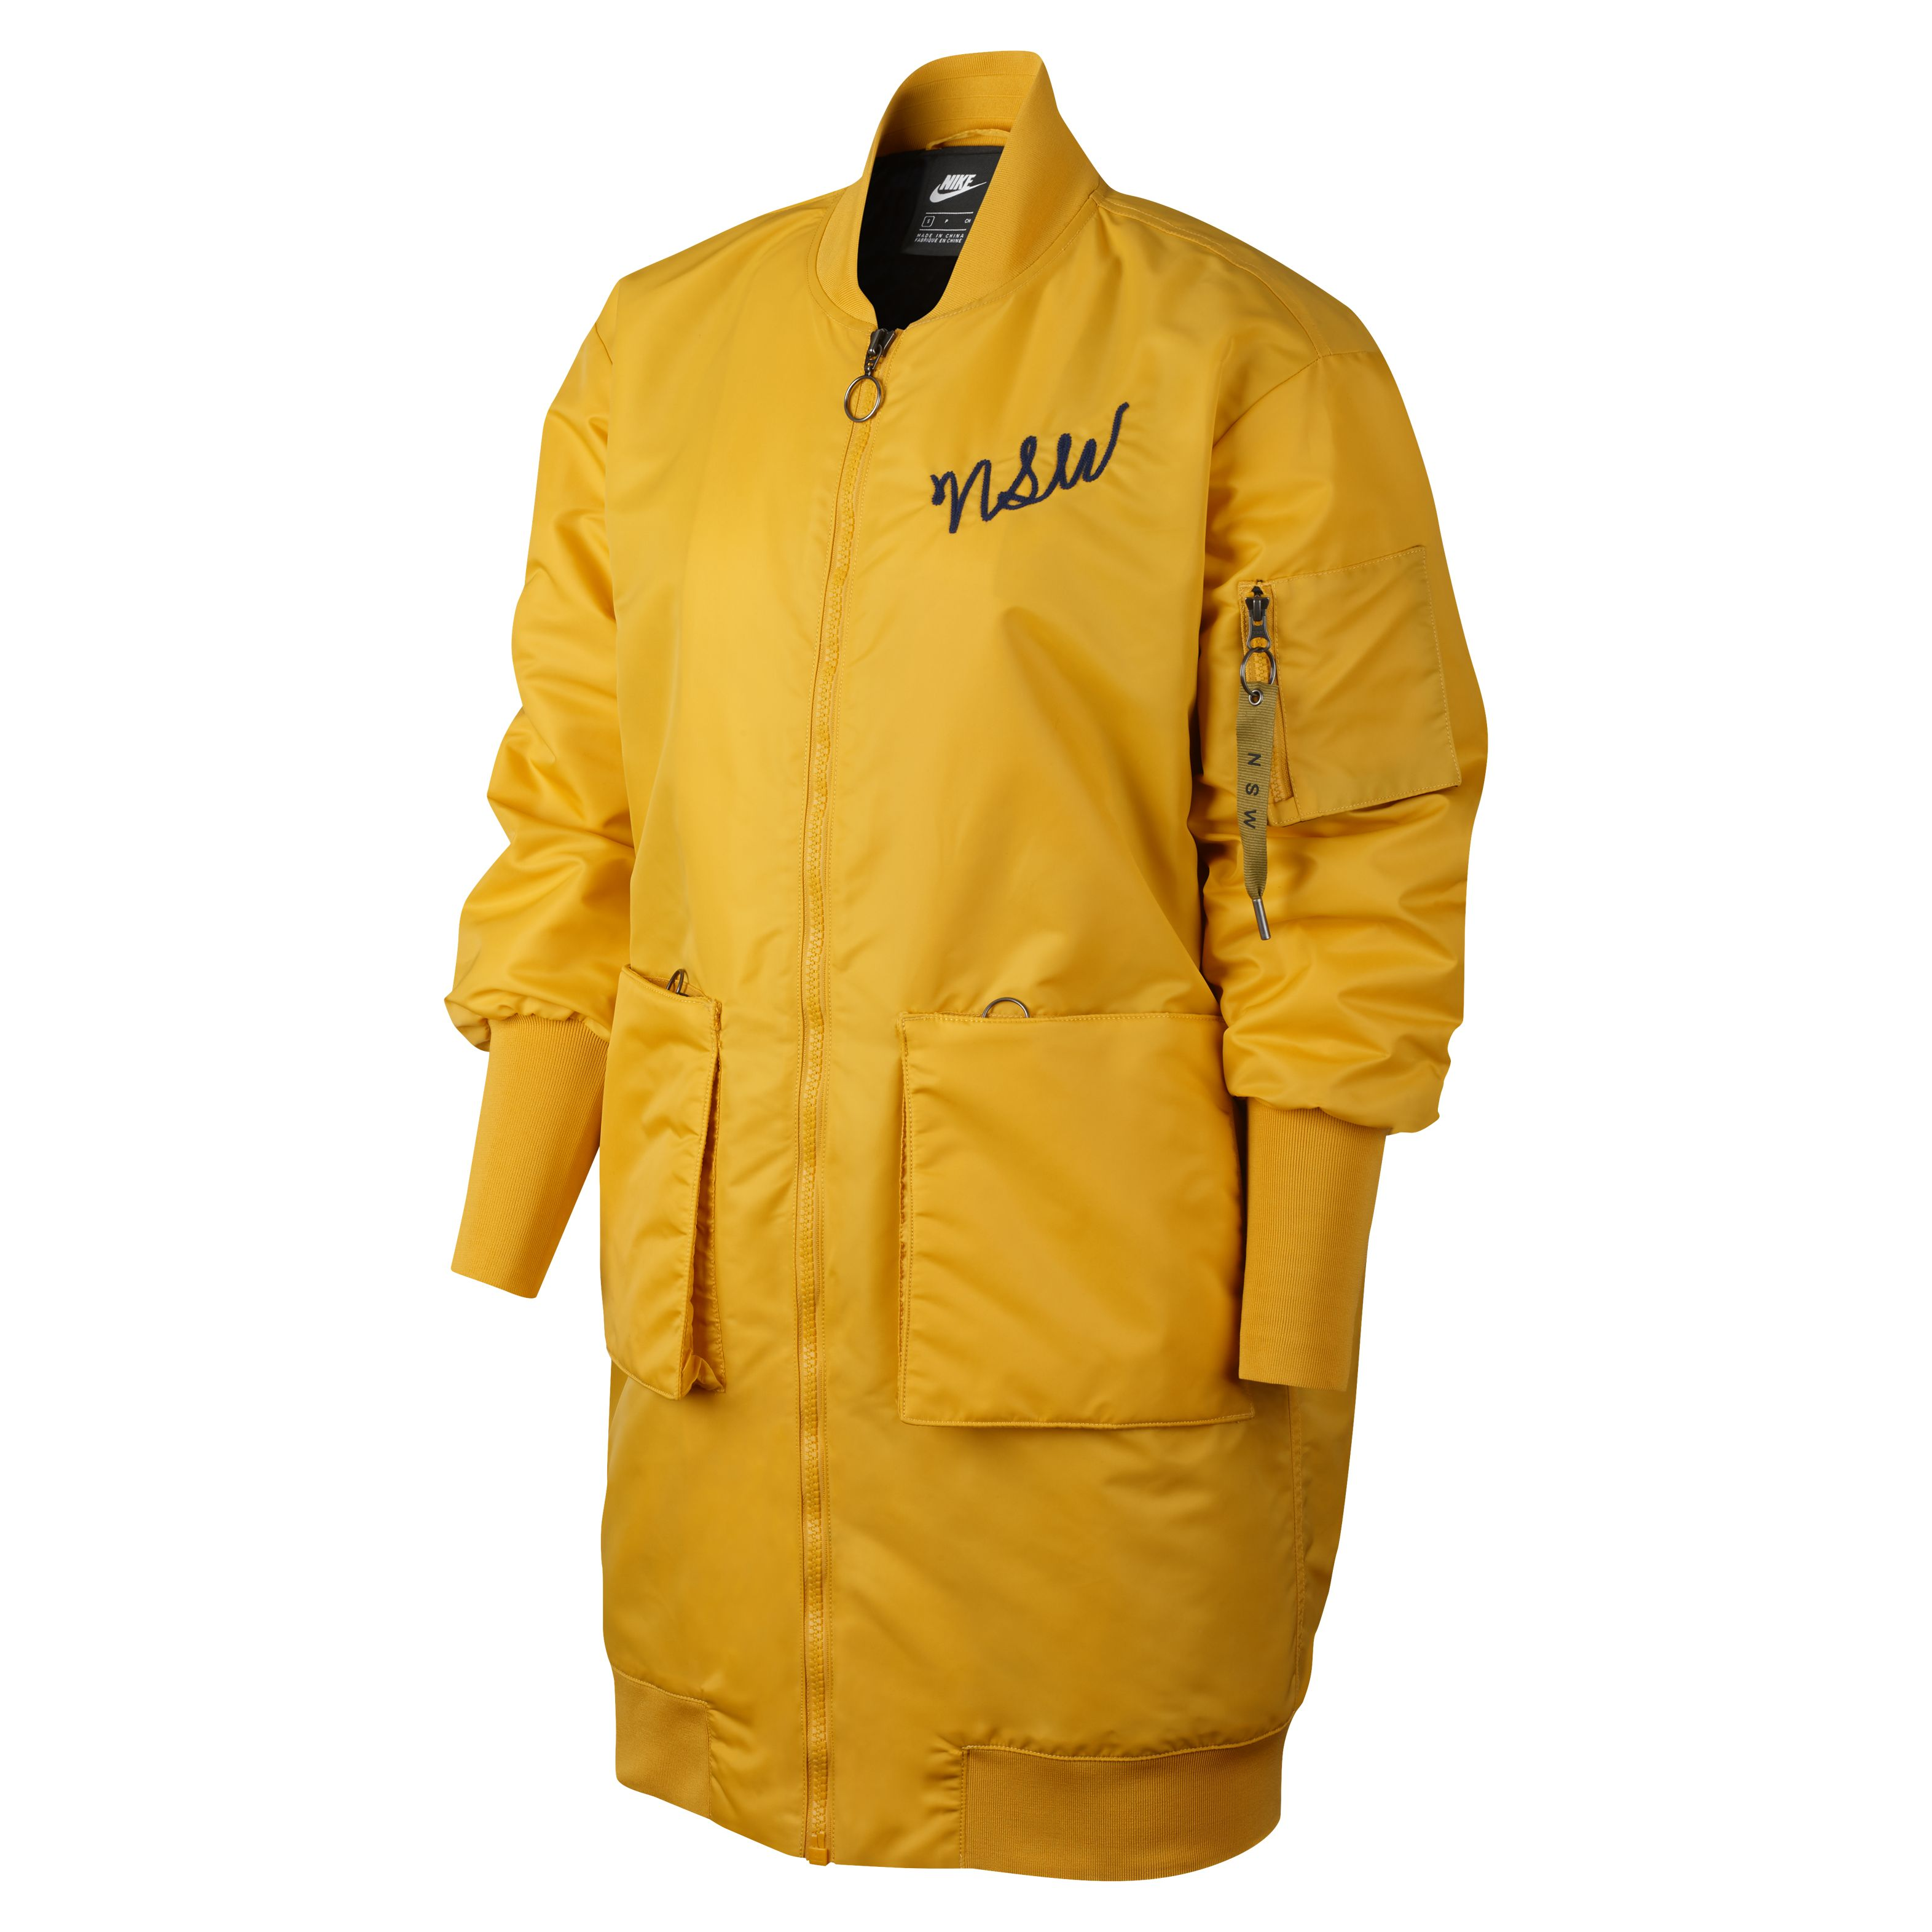 58be607b Женская куртка Nike Insulated Parka MA1 Yellow Ochre/Dark Obsidian/Dark  Obsidian - фото